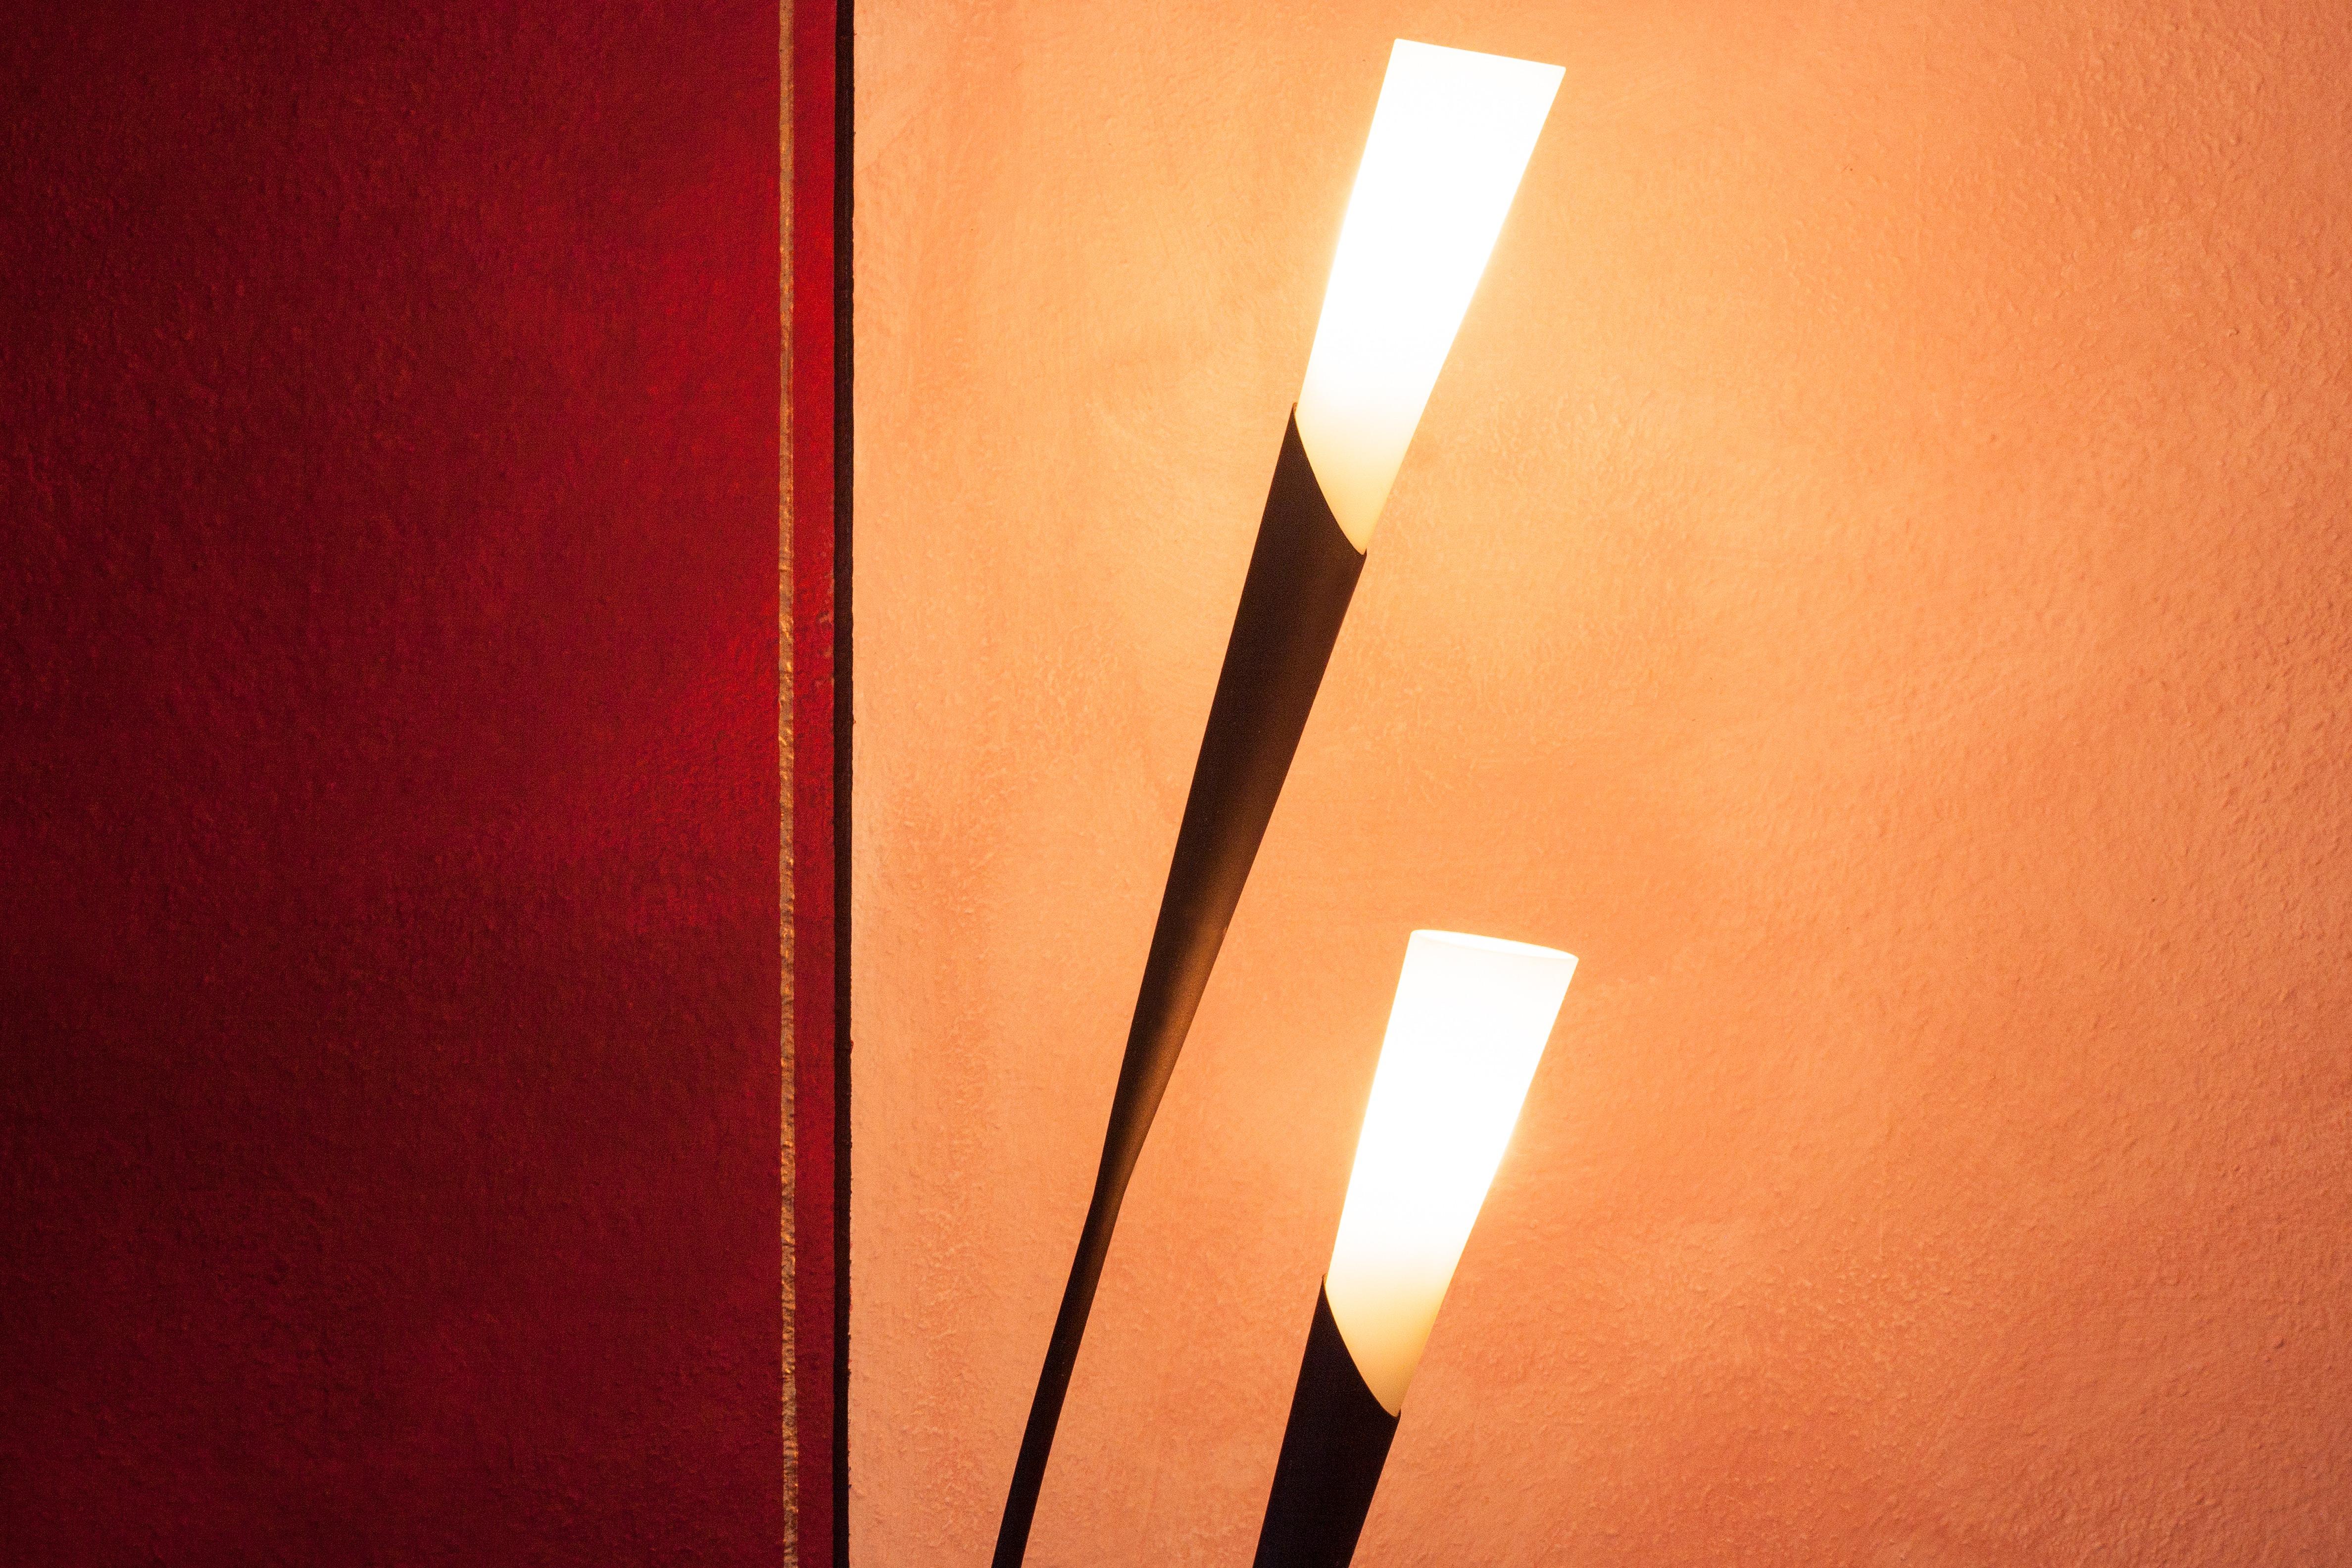 ligero calentar naranja rojo lmpara negro iluminacin flora calor oro diseo brillante lmpara ngulo noble candelabro